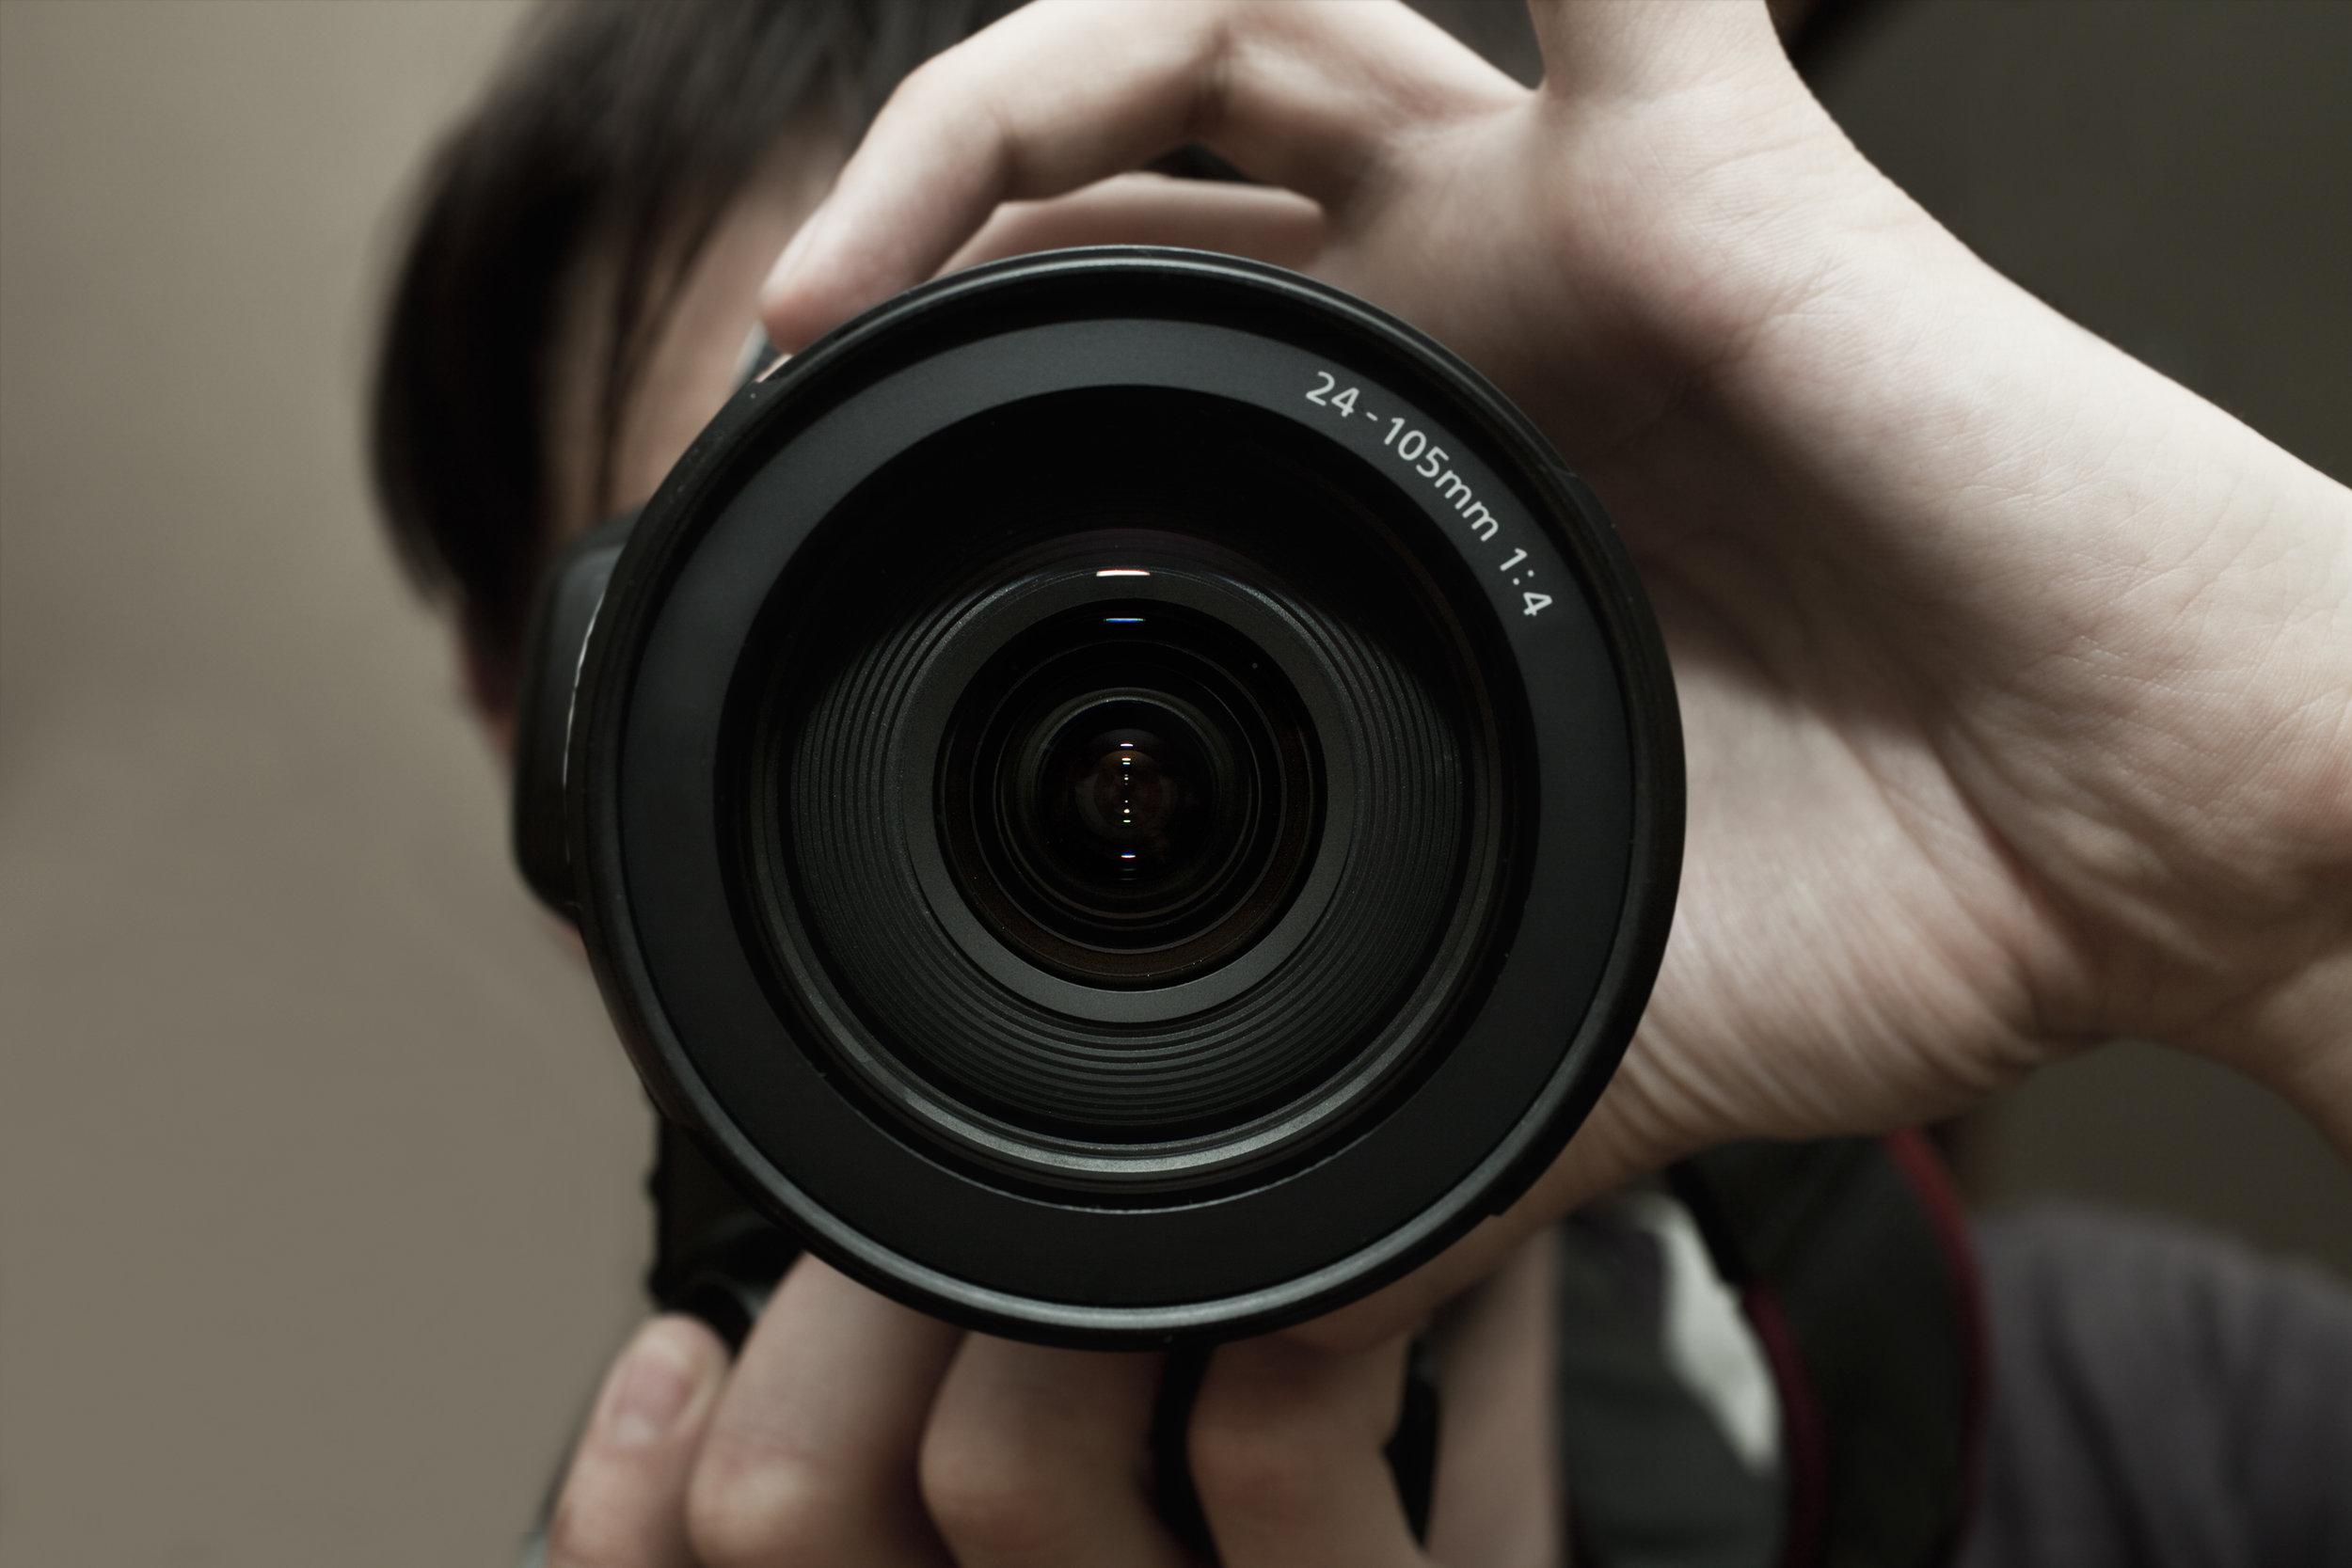 ONYX CINEMA | cinematography commercial video production | brand, print, digital, website, web design